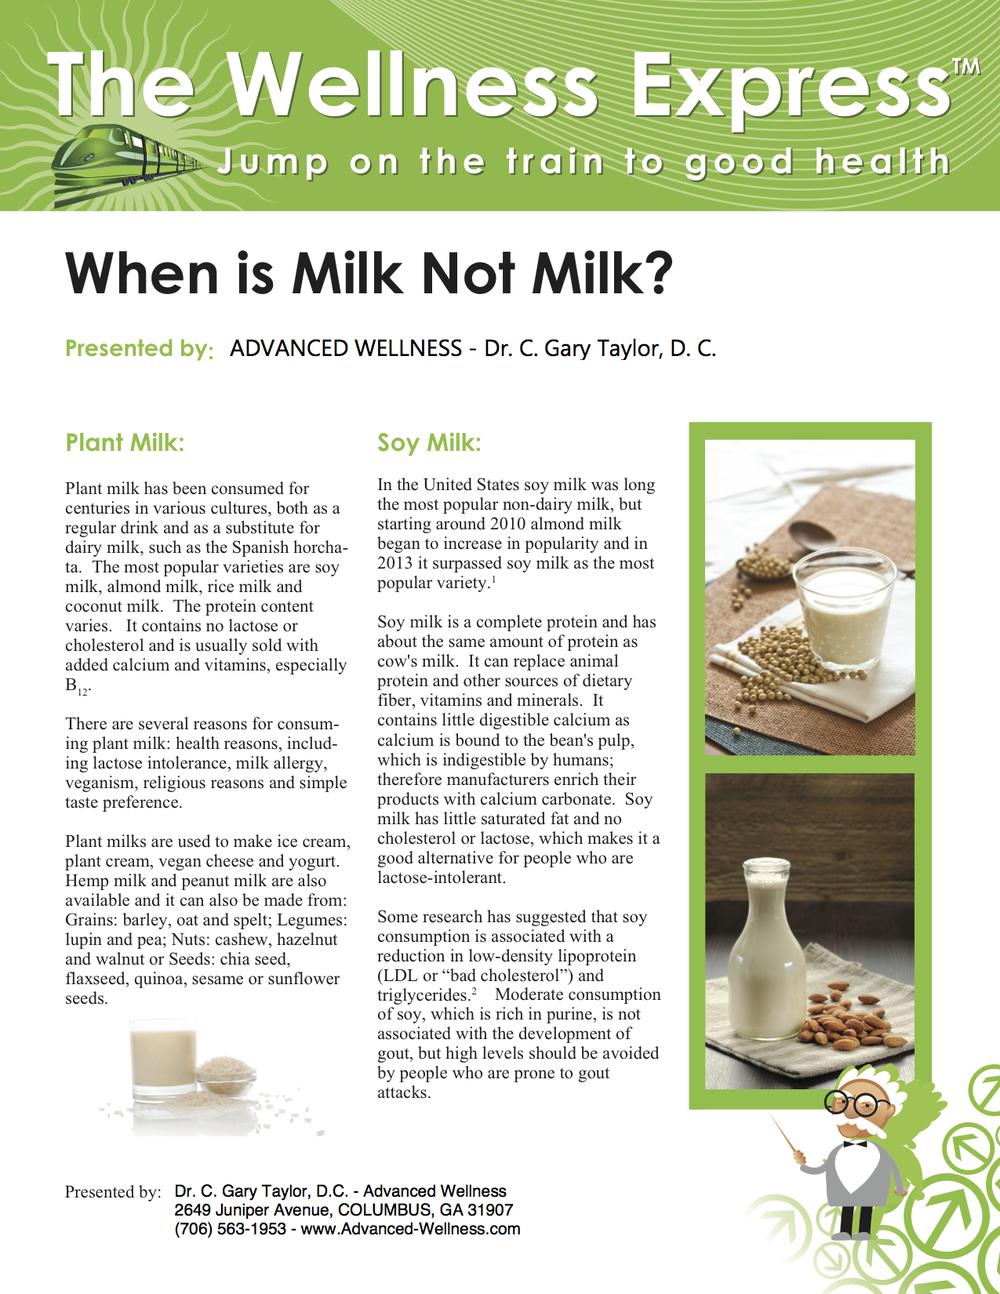 Weekly Newsletter: When Is Milk Not Milk?